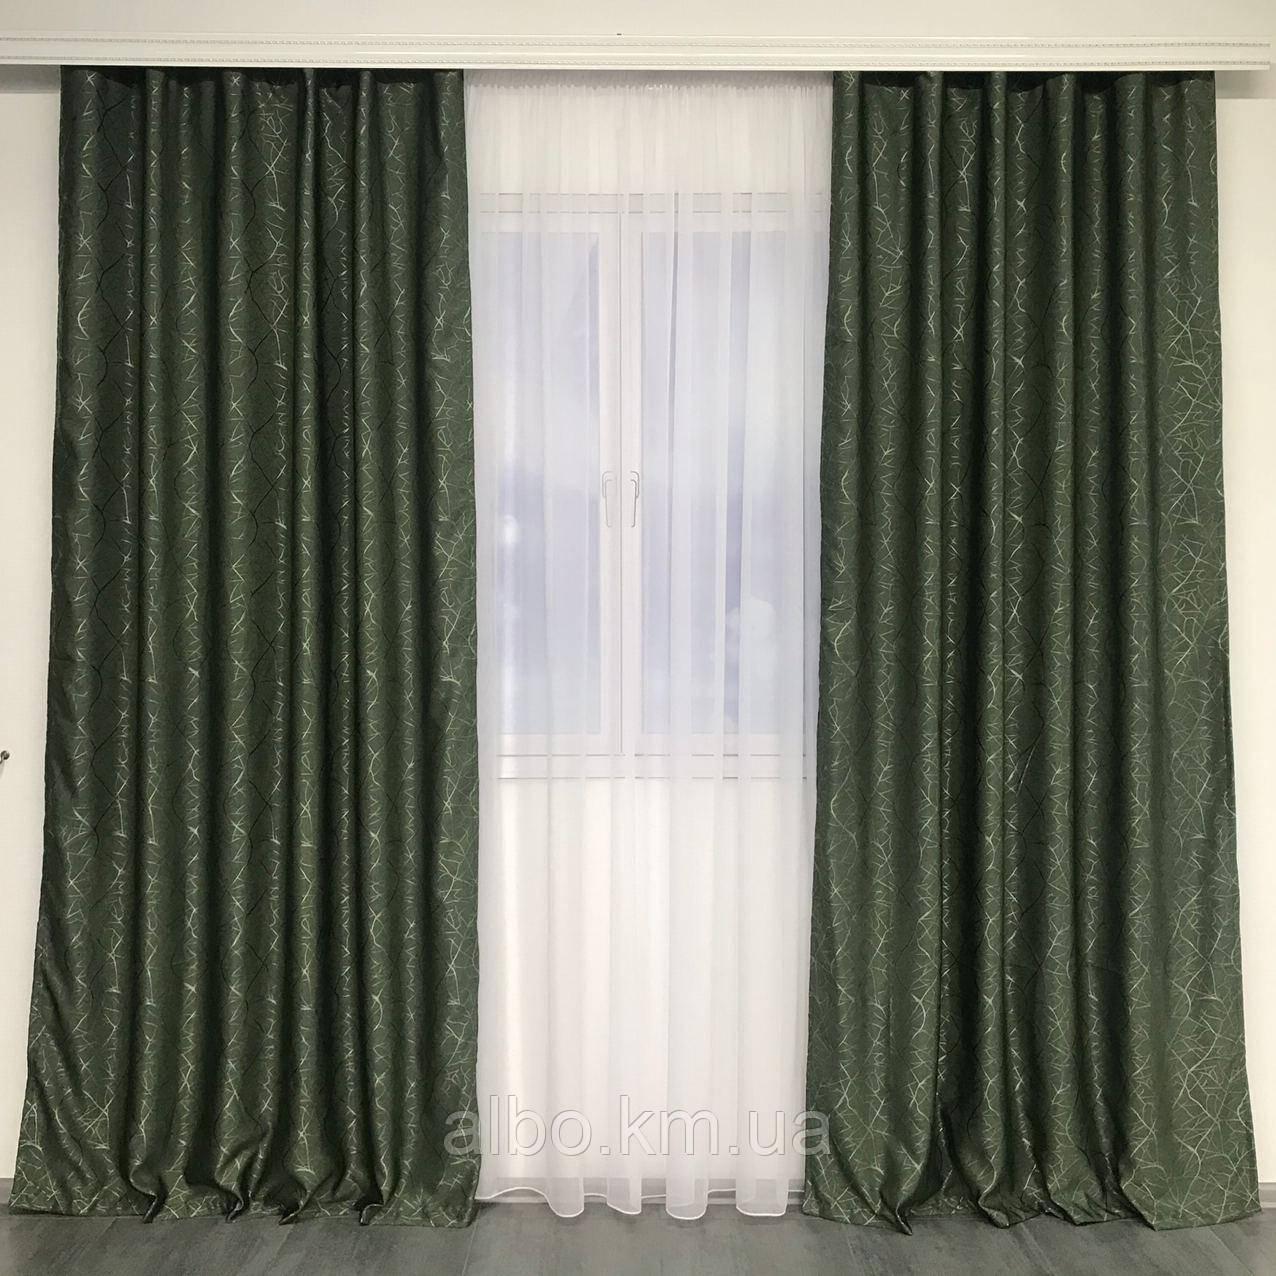 Светоотражающие шторы из льна Блэкаут ALBO 150x270 cm (2 шт) Зеленые (SH-M17-4)